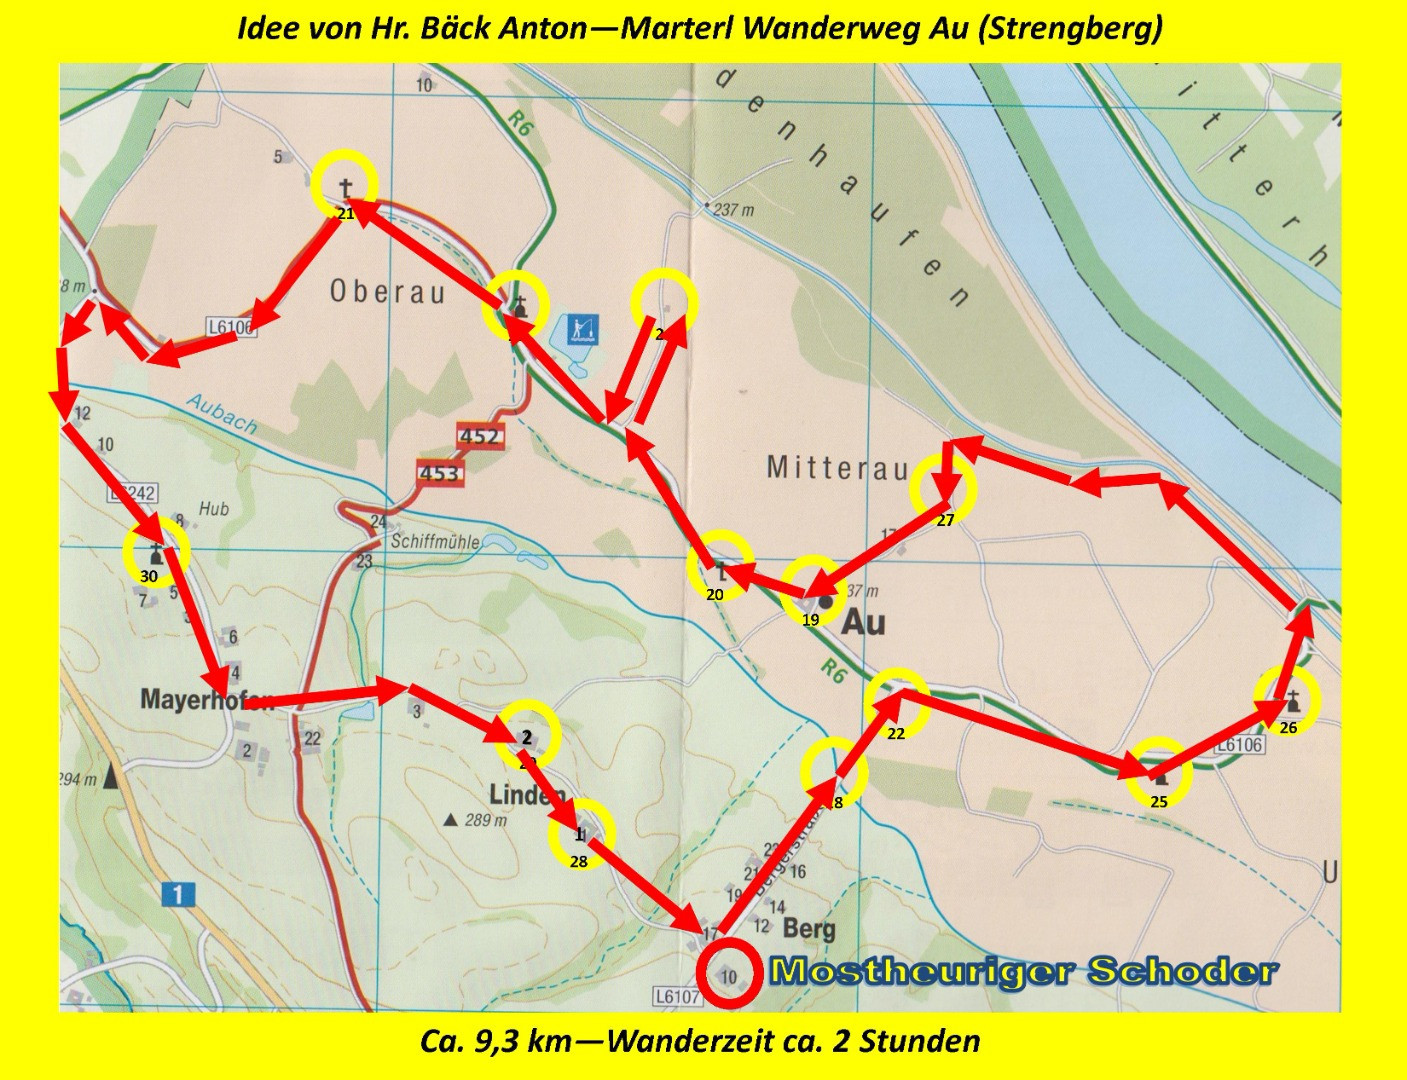 Marter-Wanderweg-Au 2021.jpg